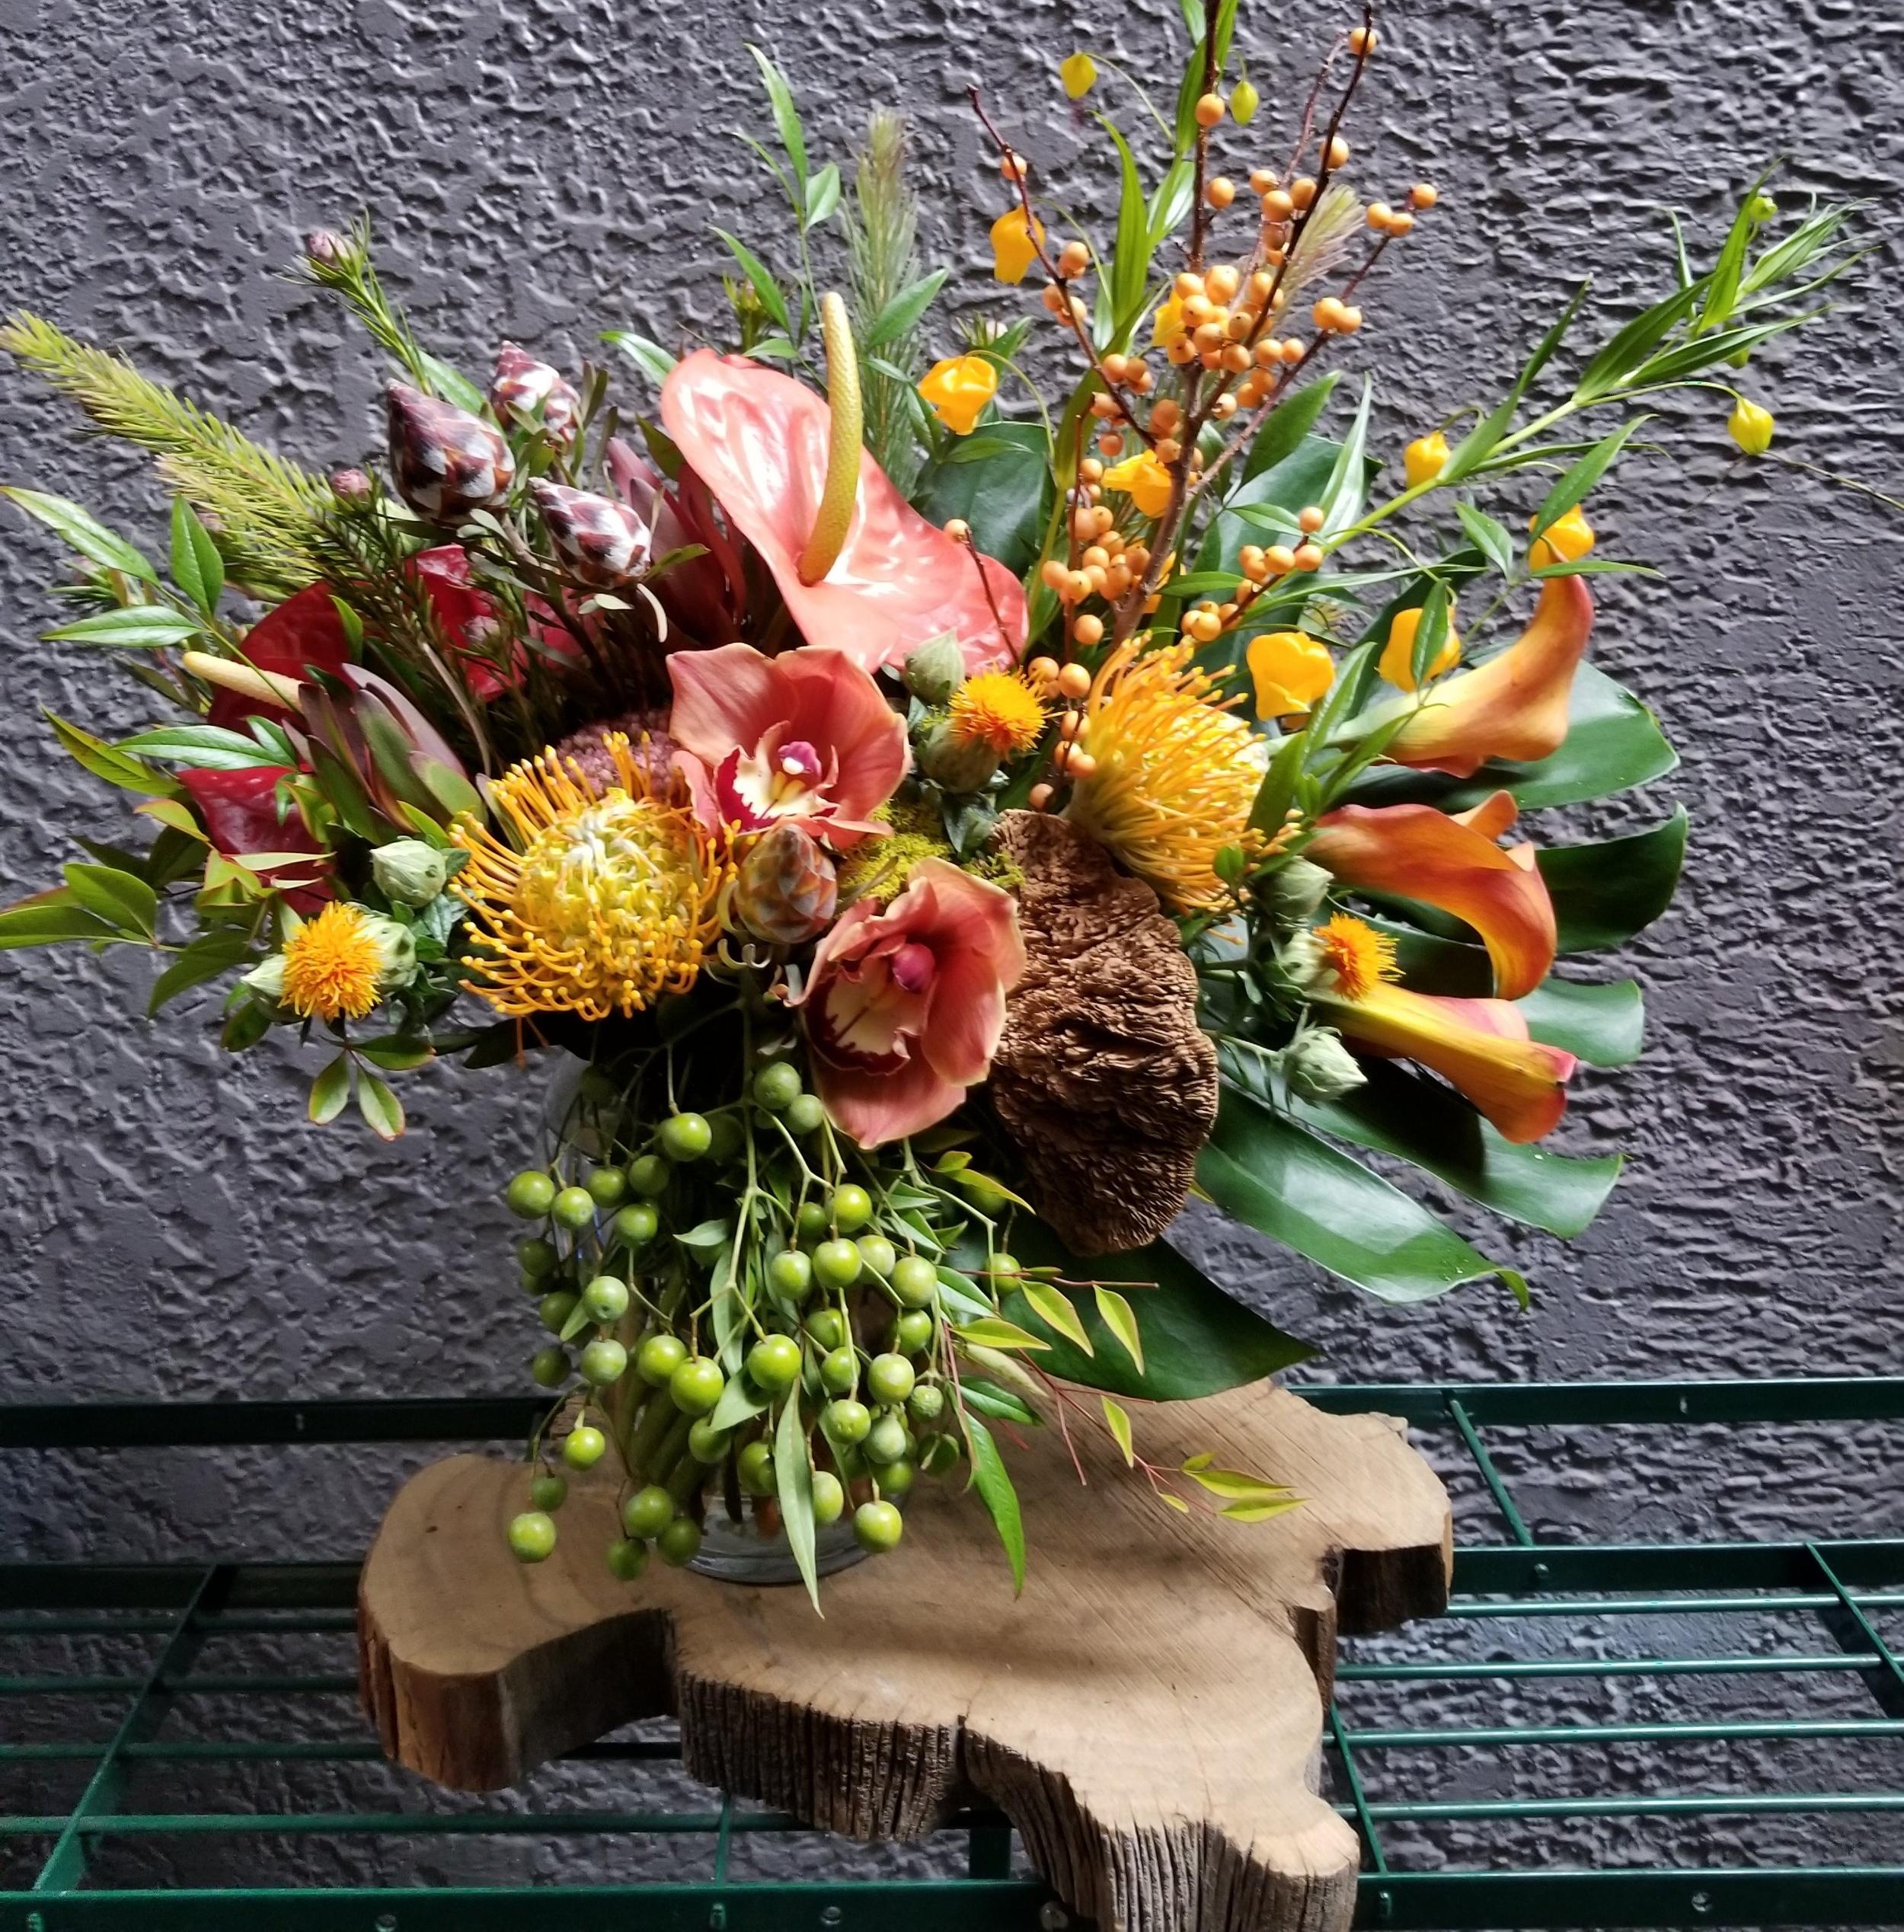 7. Unusual Fall Tropical Arrangement